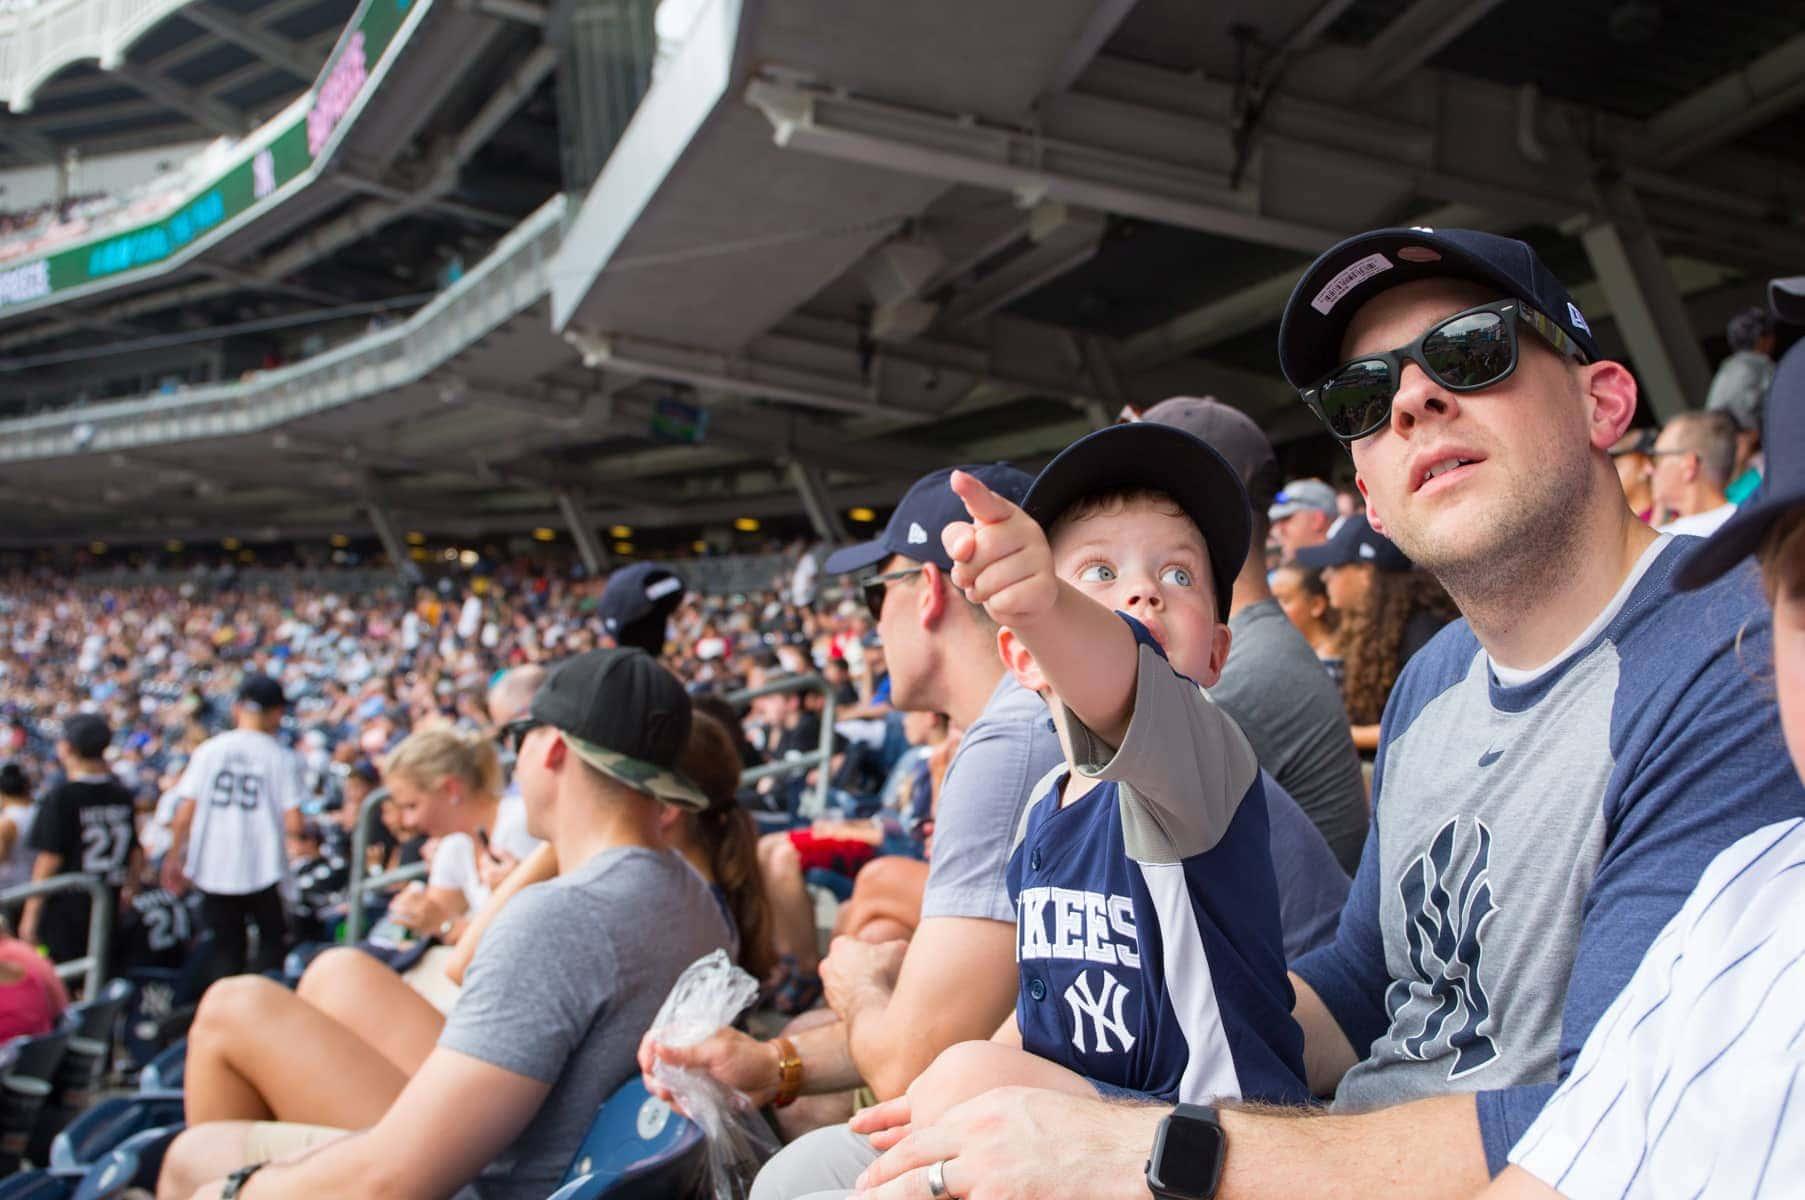 Eddie pointing to something at a baseball game